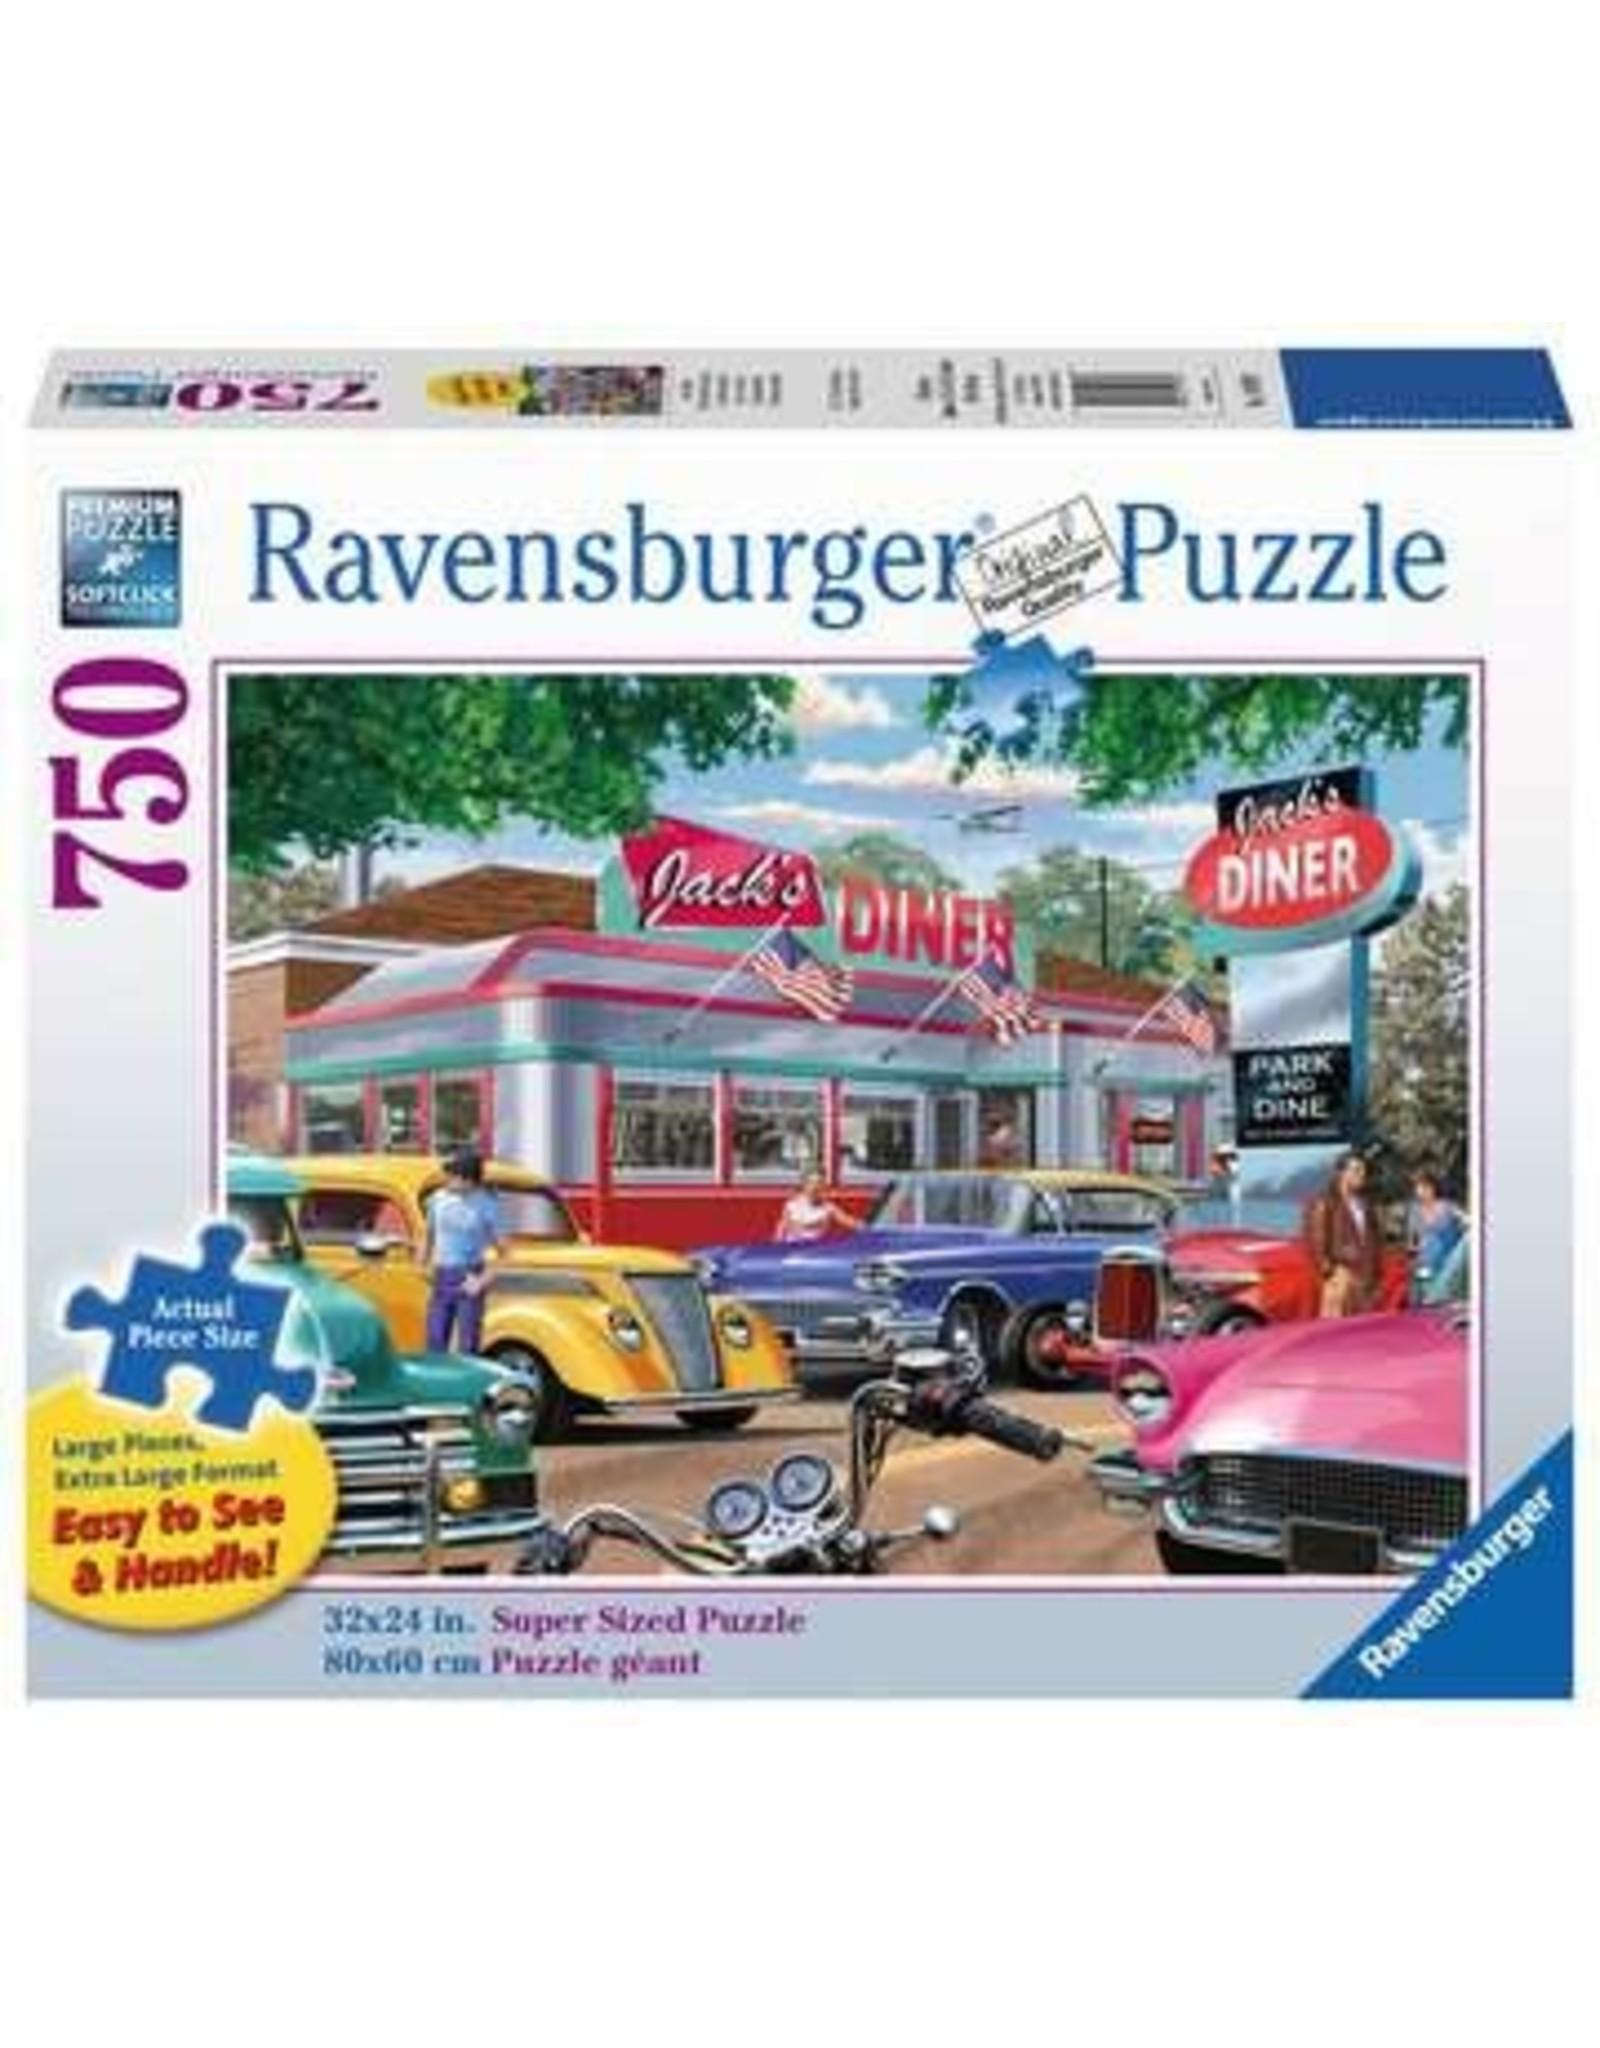 Ravensburger Meet you at Jack's